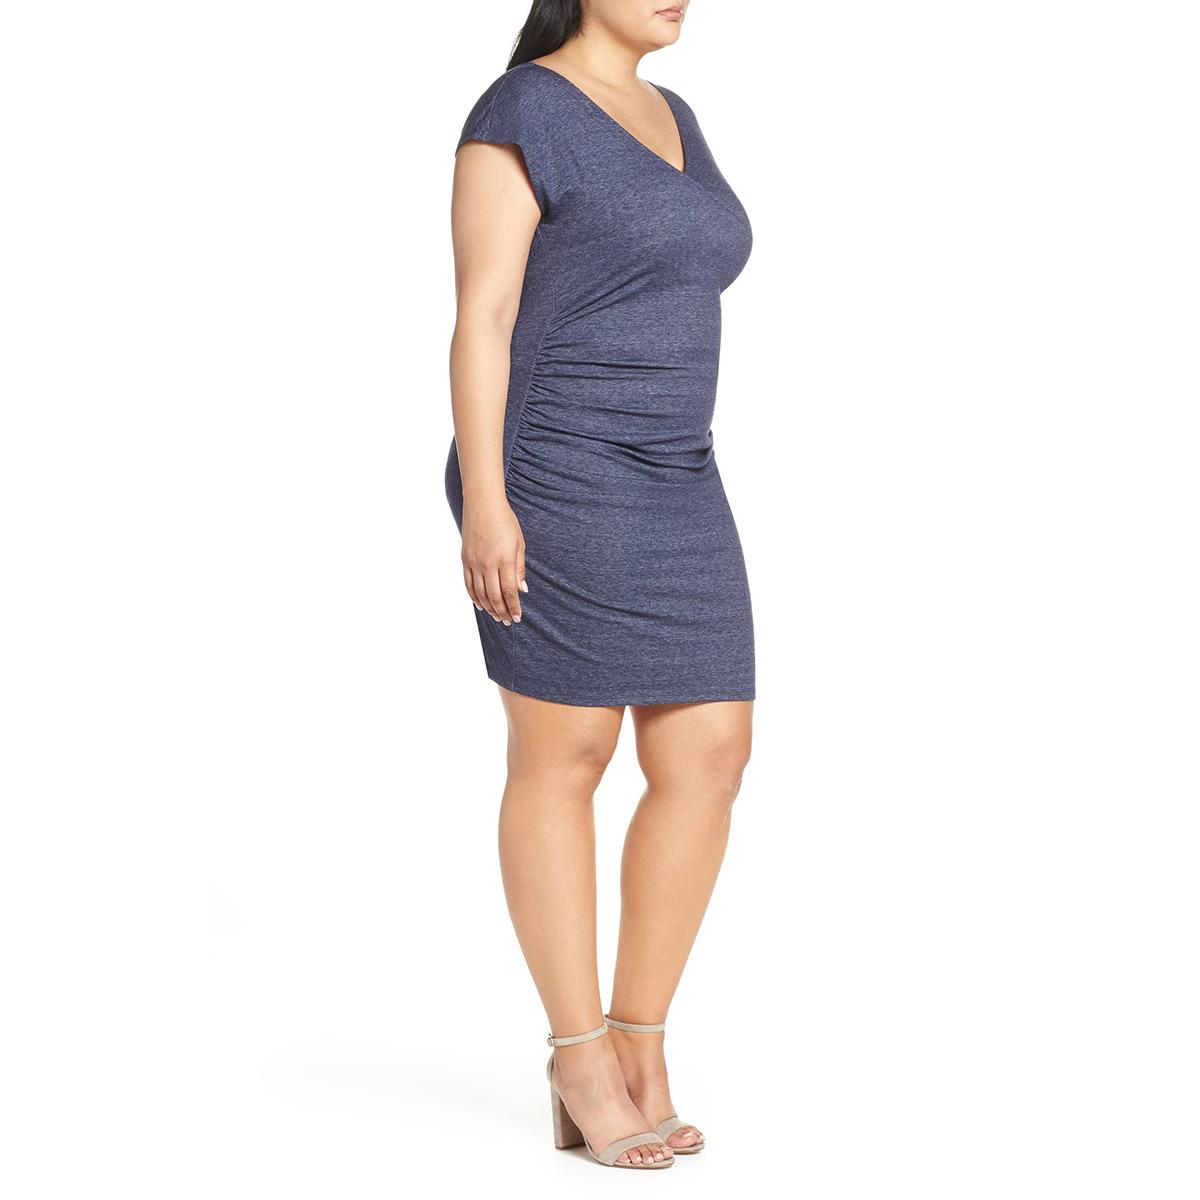 Blue Surplice Dress